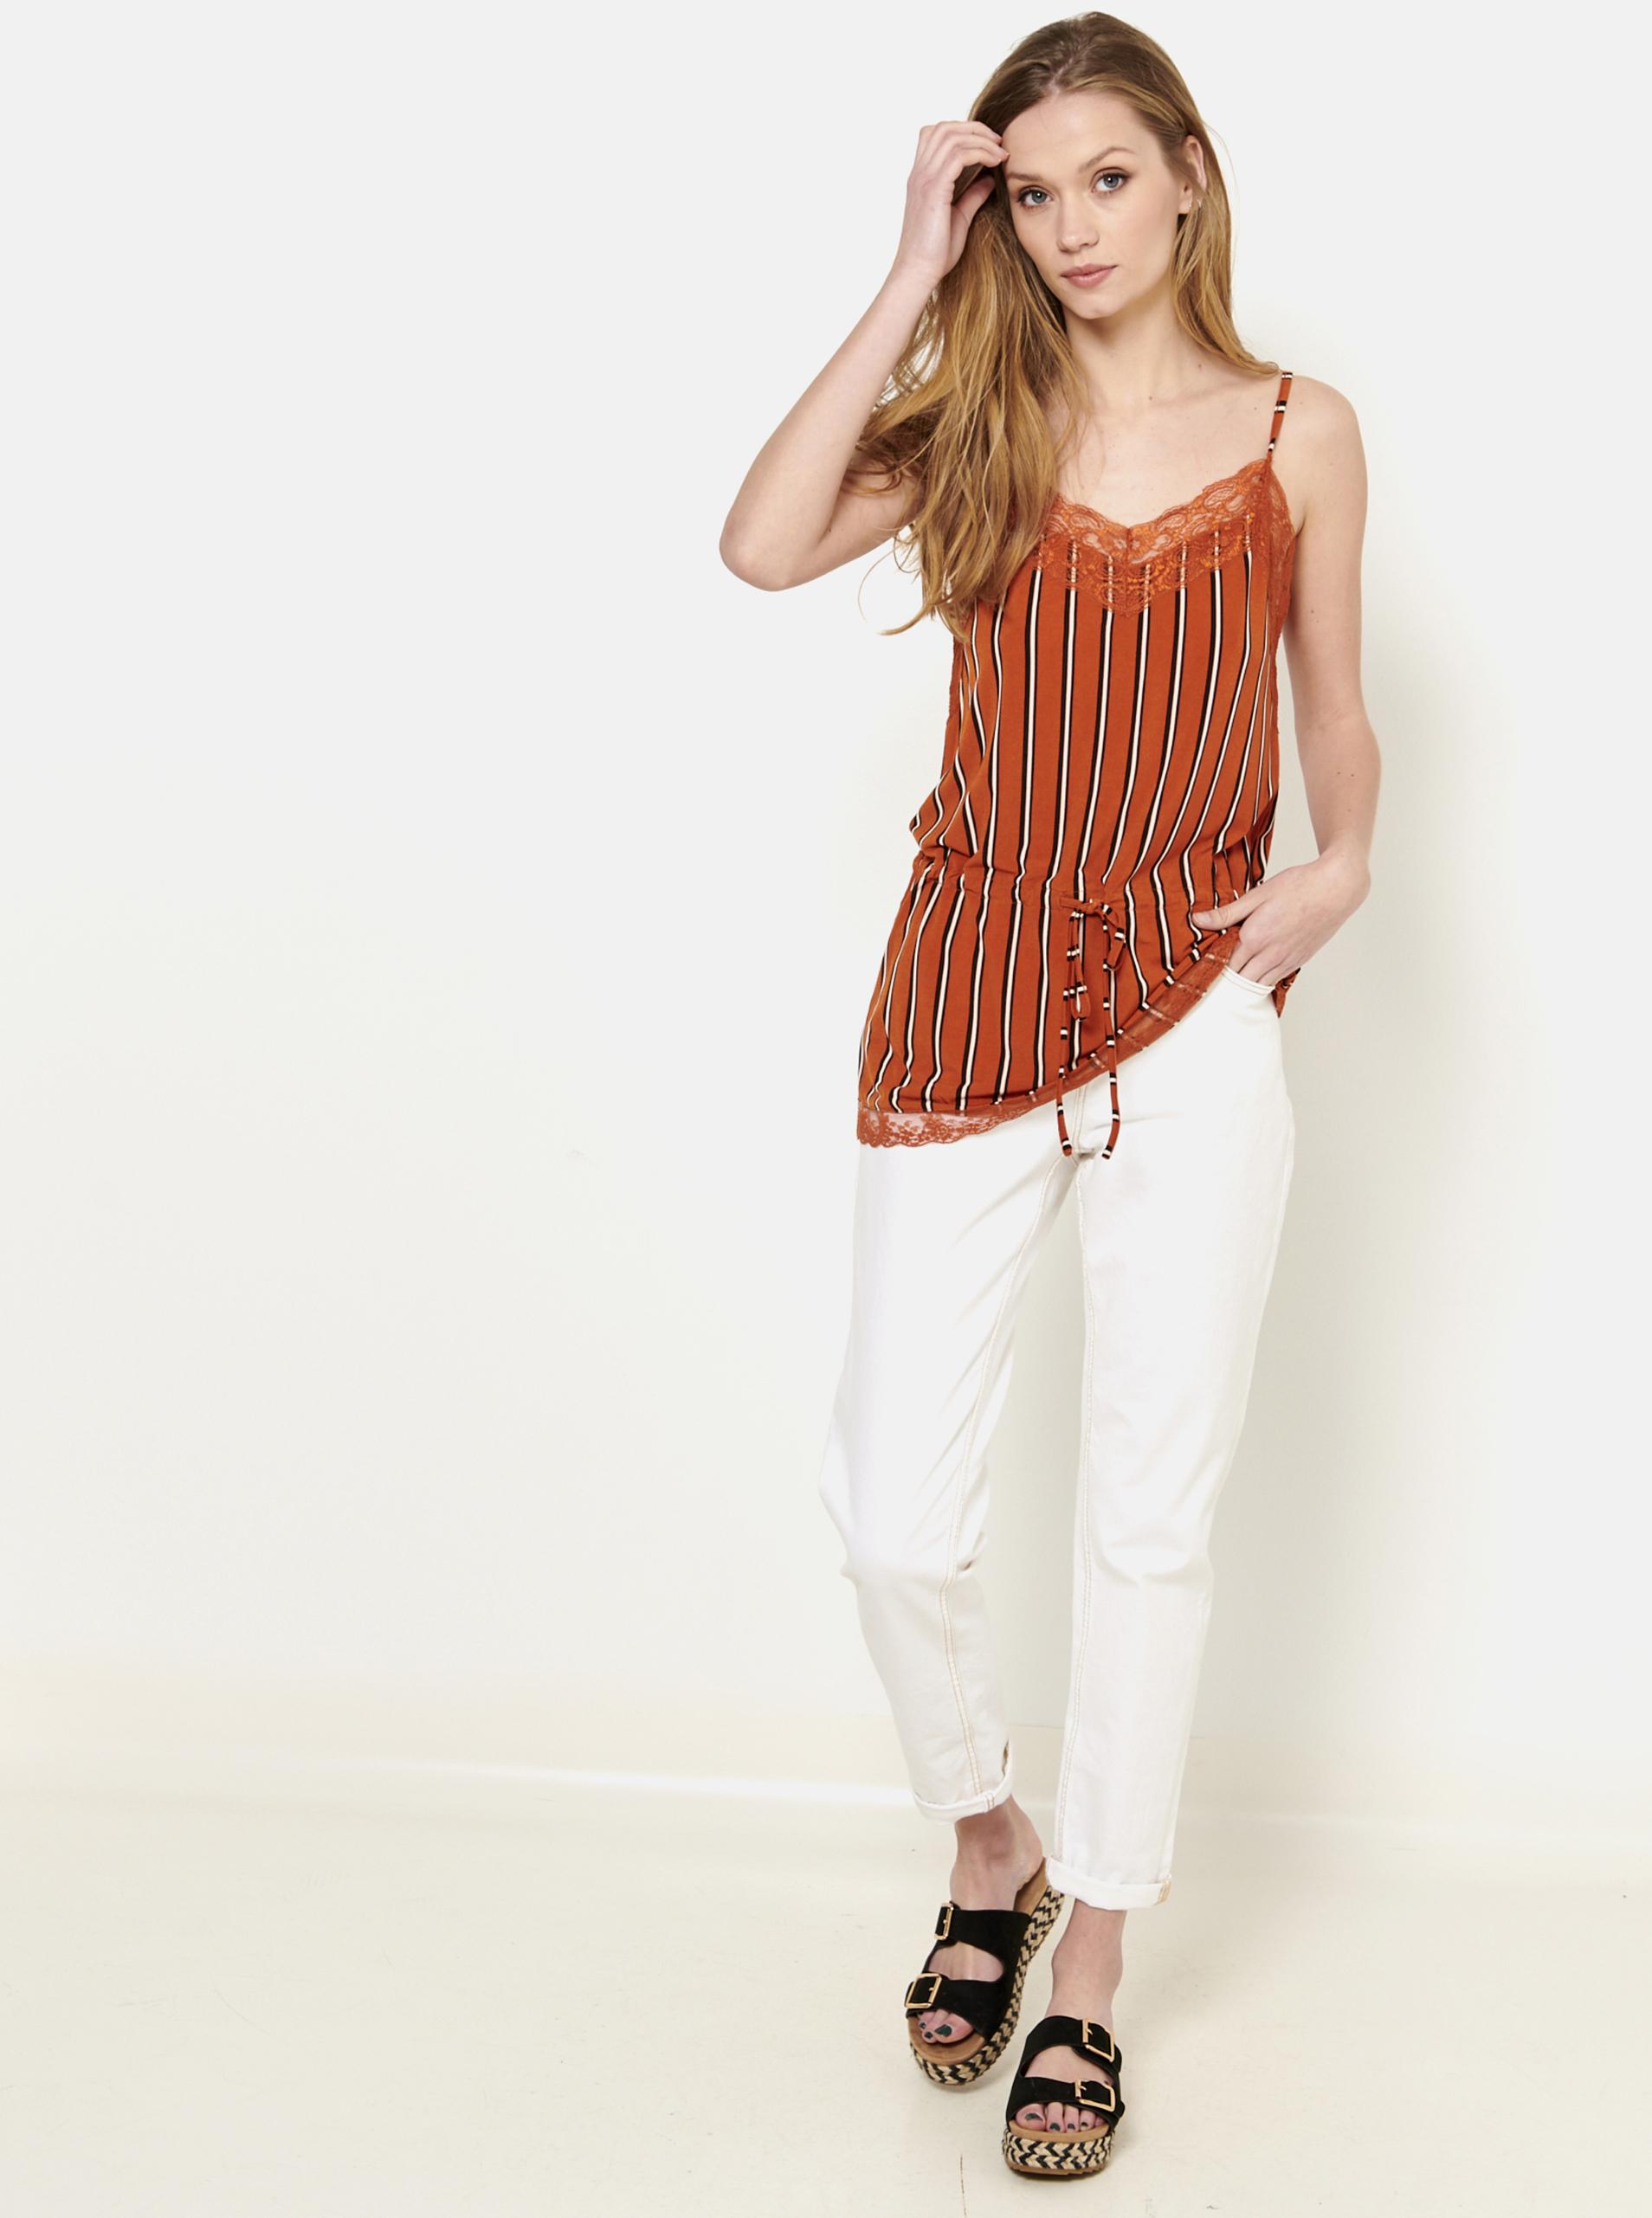 CAMAIEU orange striped top with lace